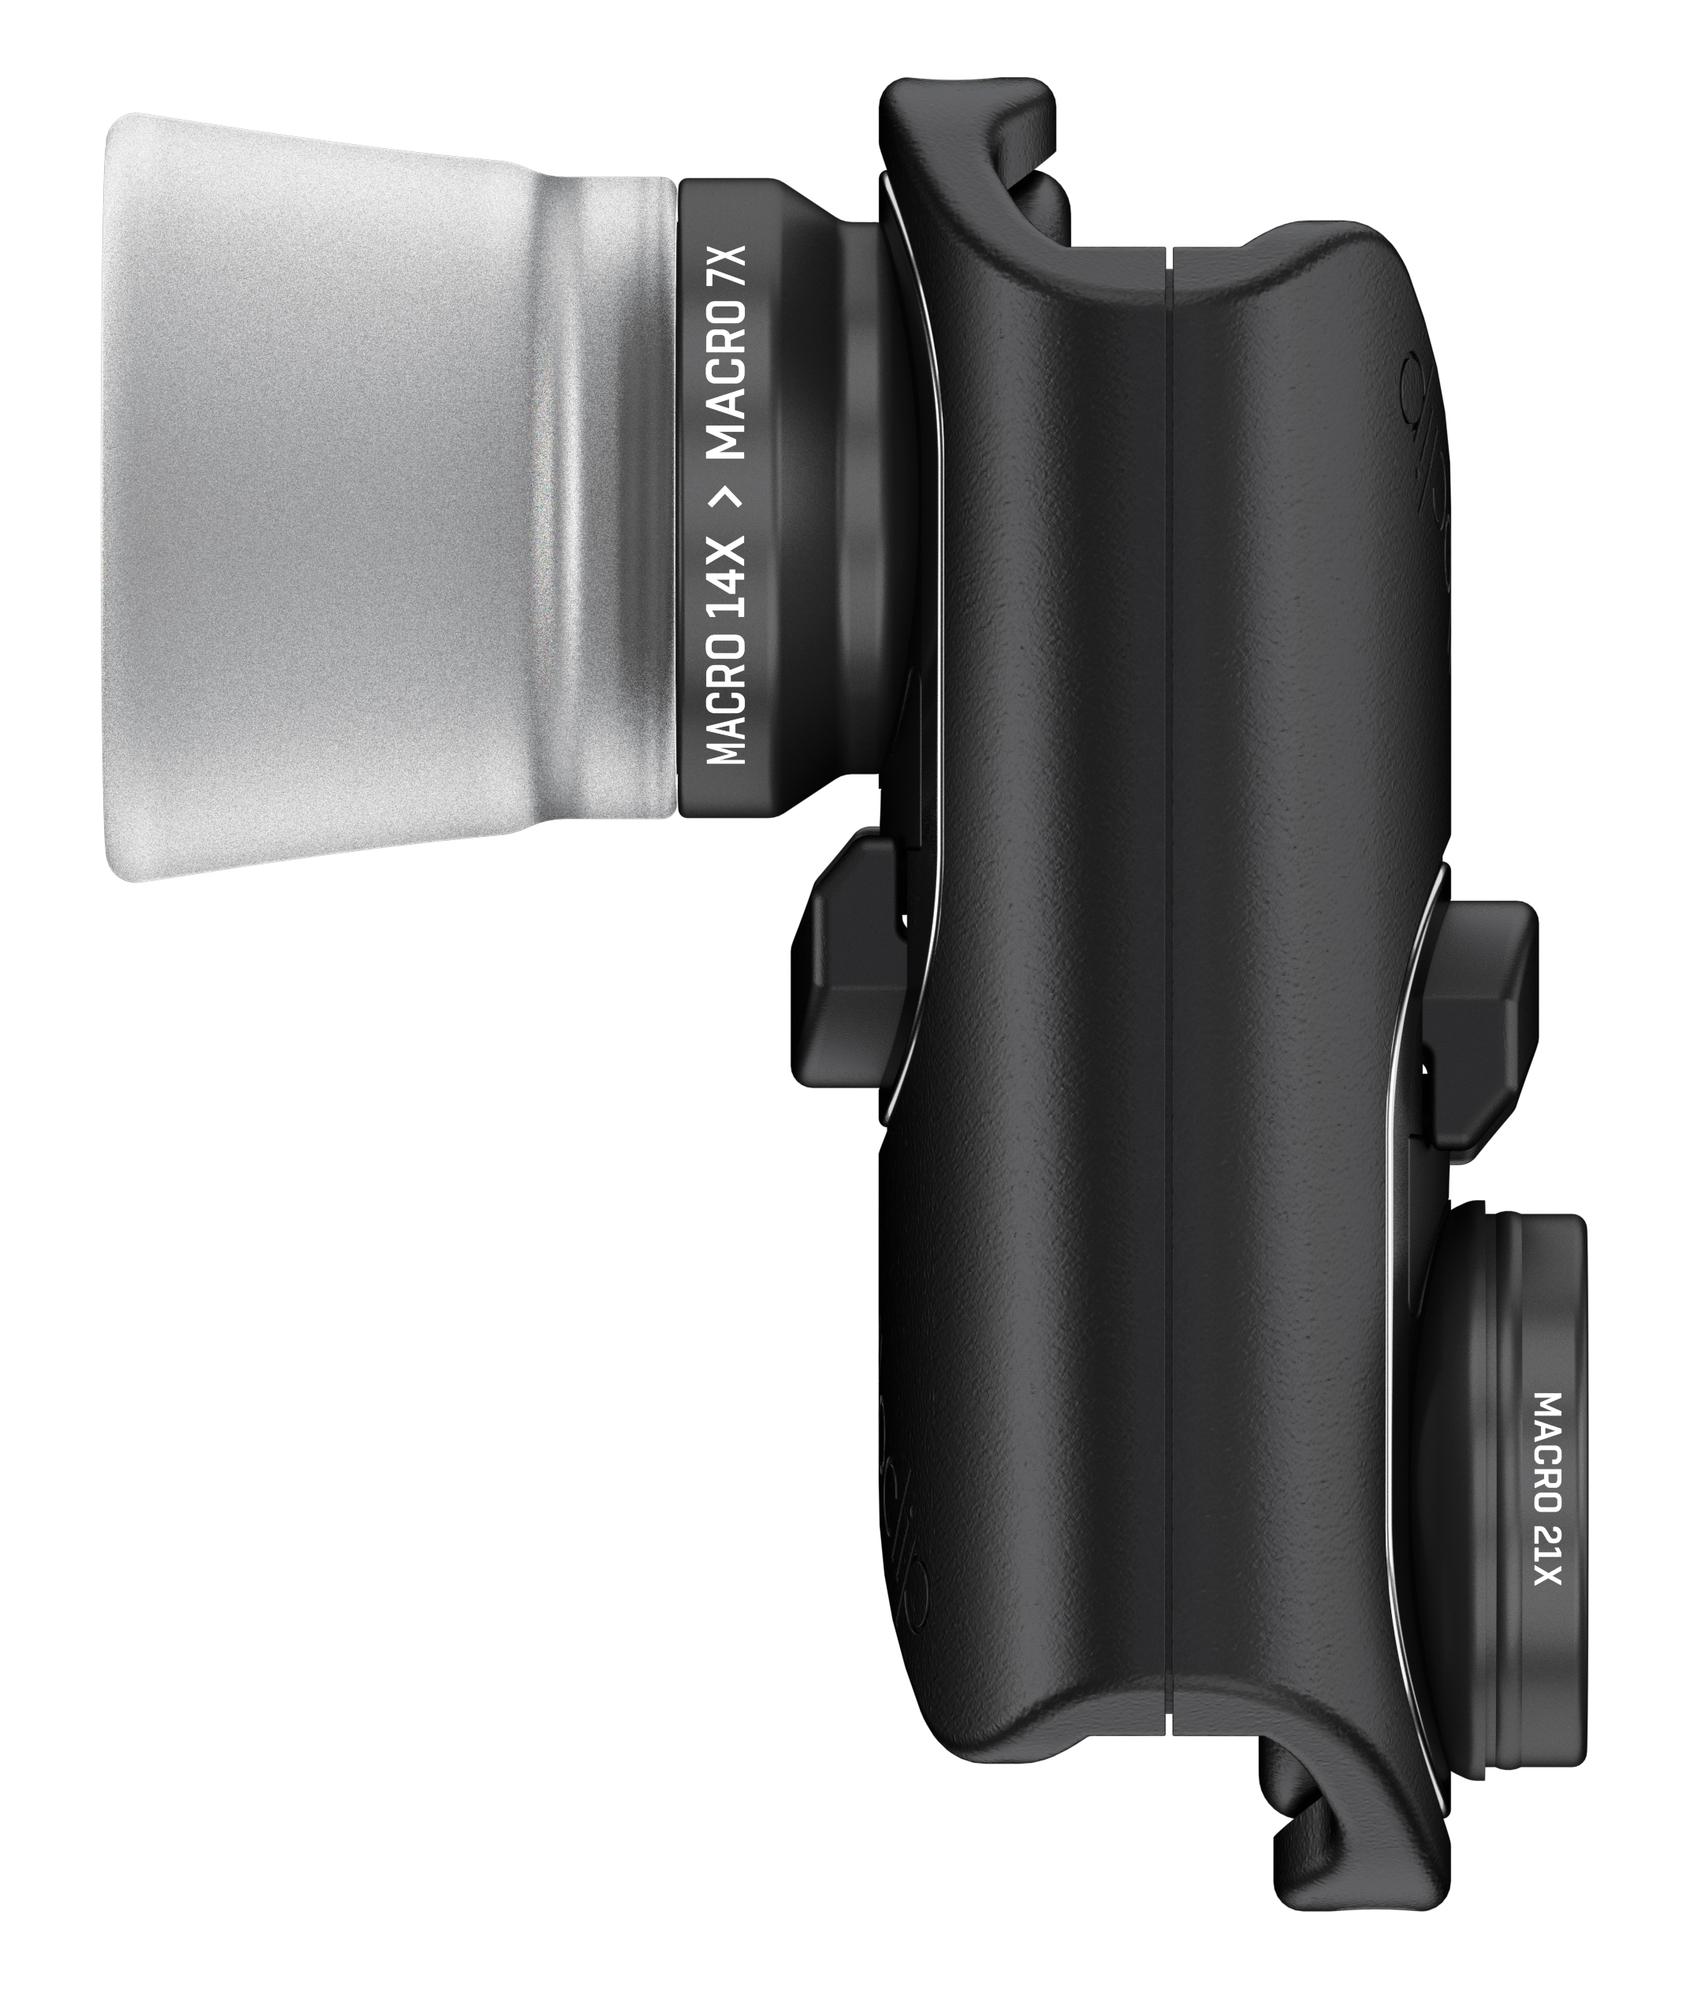 Objektiv pro iPhone 7 a iPhone 7 Plus - OlloClip, Macro Pro Lens